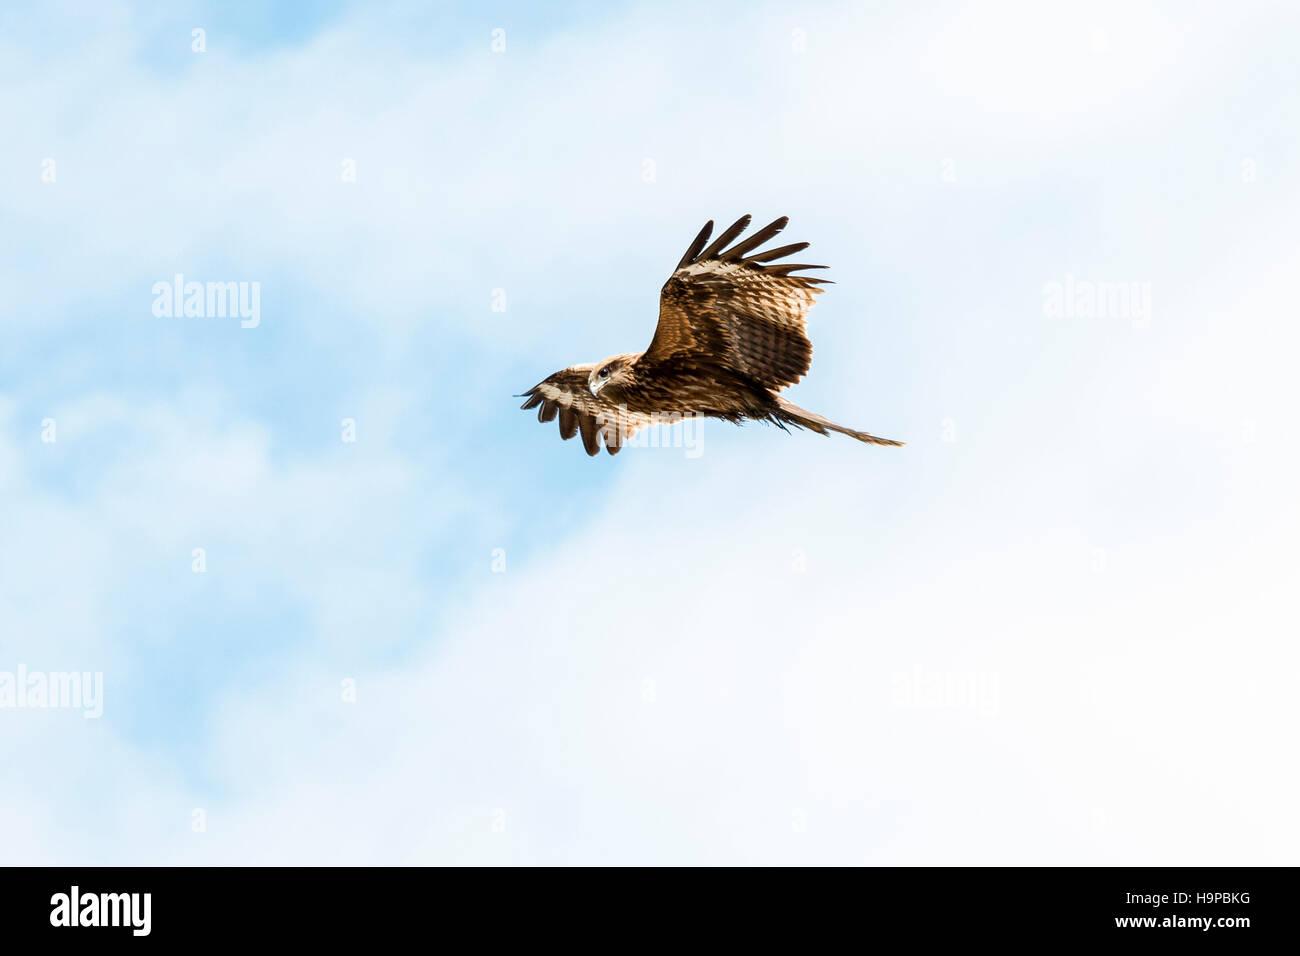 Japón Akashi. Ave de rapiña. Milano negro, negro kite orejudo (Milvus migrans lineatus), en vuelo por encima de Foto de stock